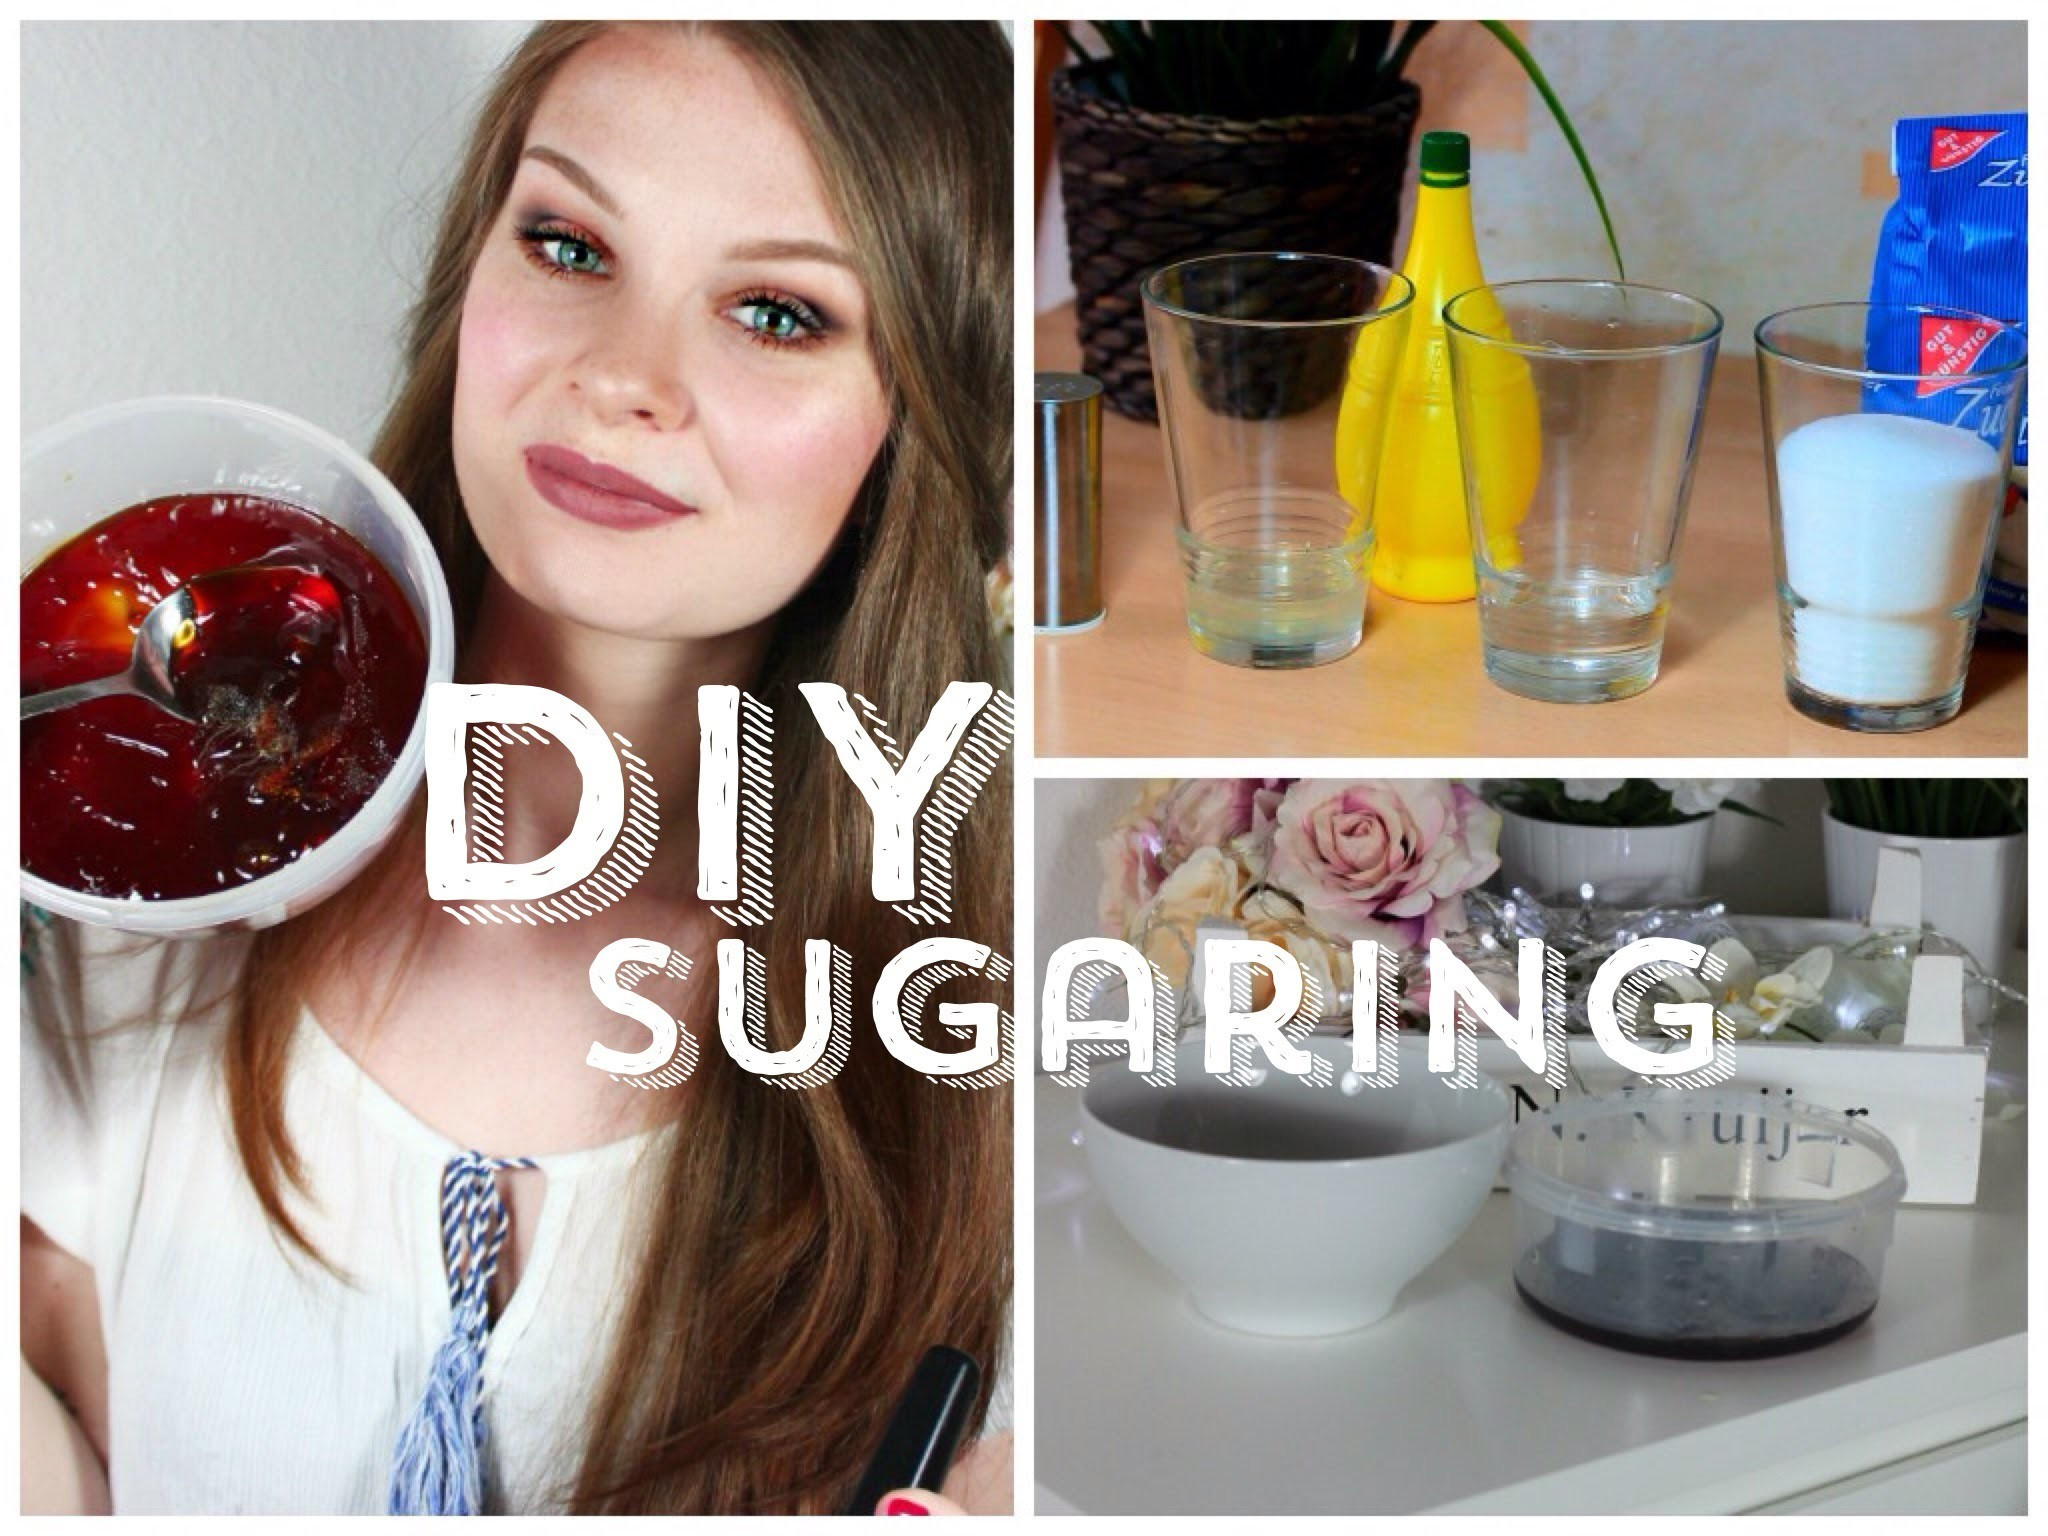 Sugaring Paste Diy  Sugaring Haarentfernung • DIY ZUCKERPASTE